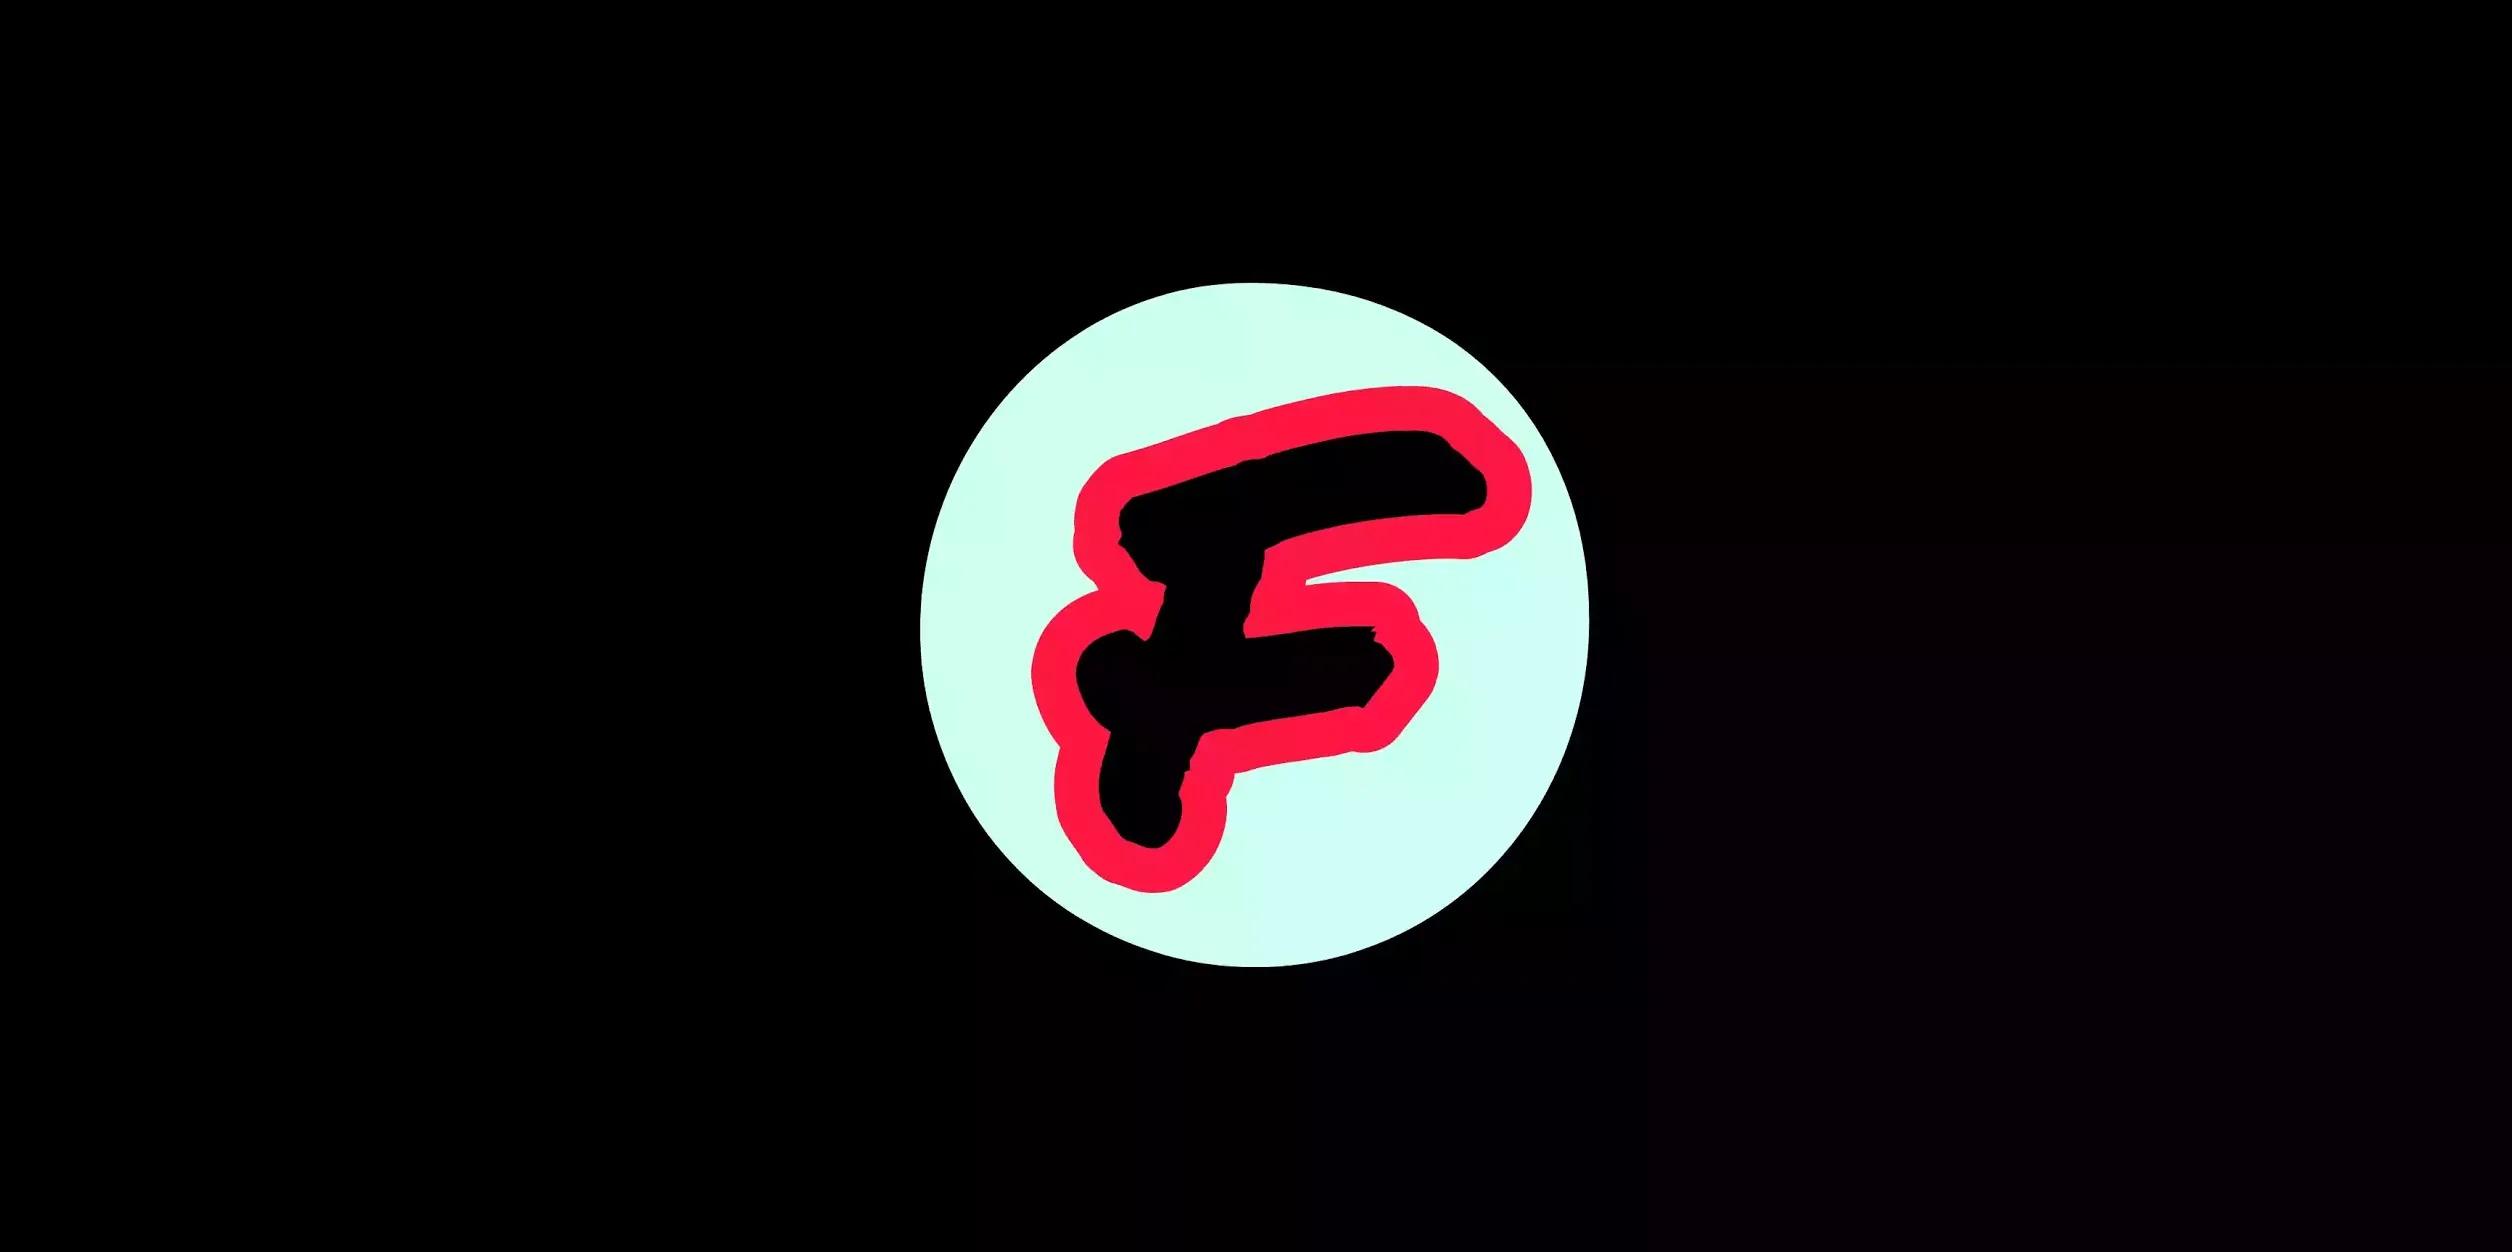 How do I make or create a favicon icon?